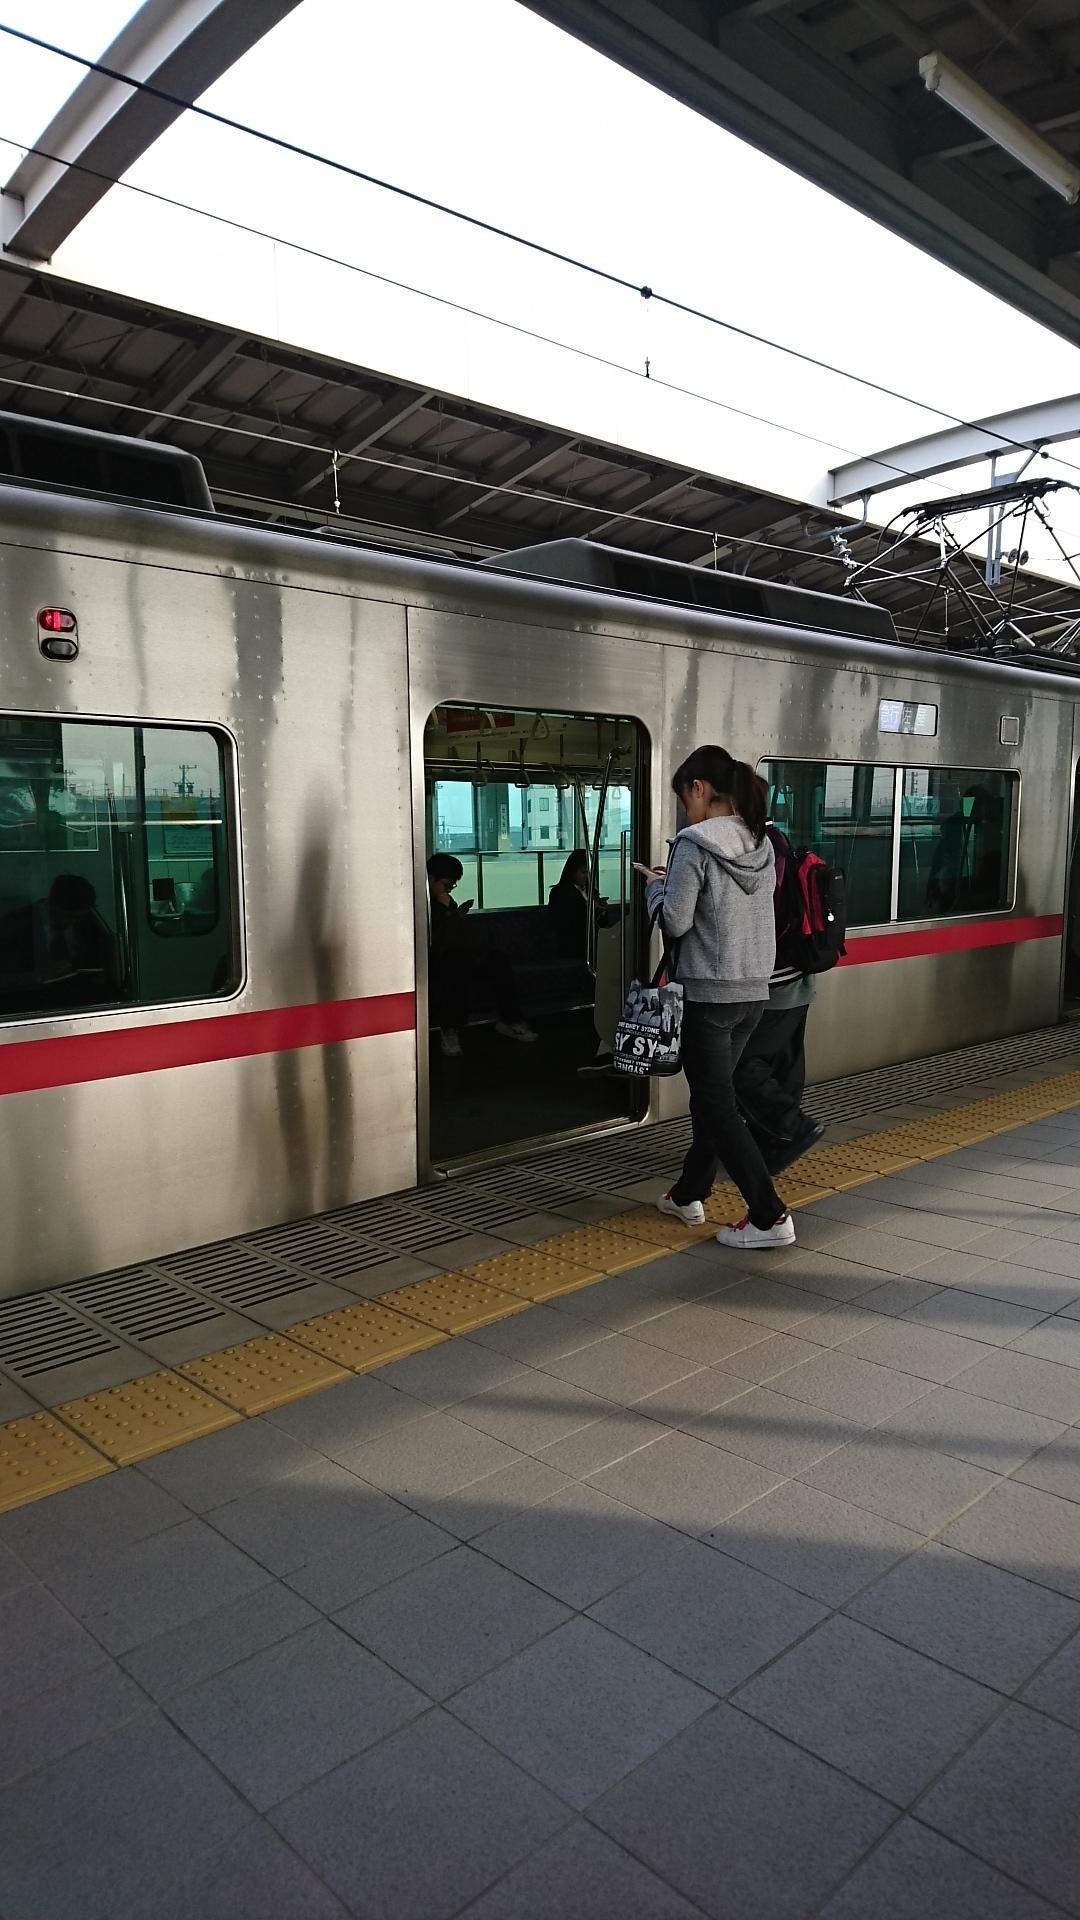 2018.3.15 名鉄 (4) 桜井 - 佐屋いき急行(5002編成4両) 1080-1920